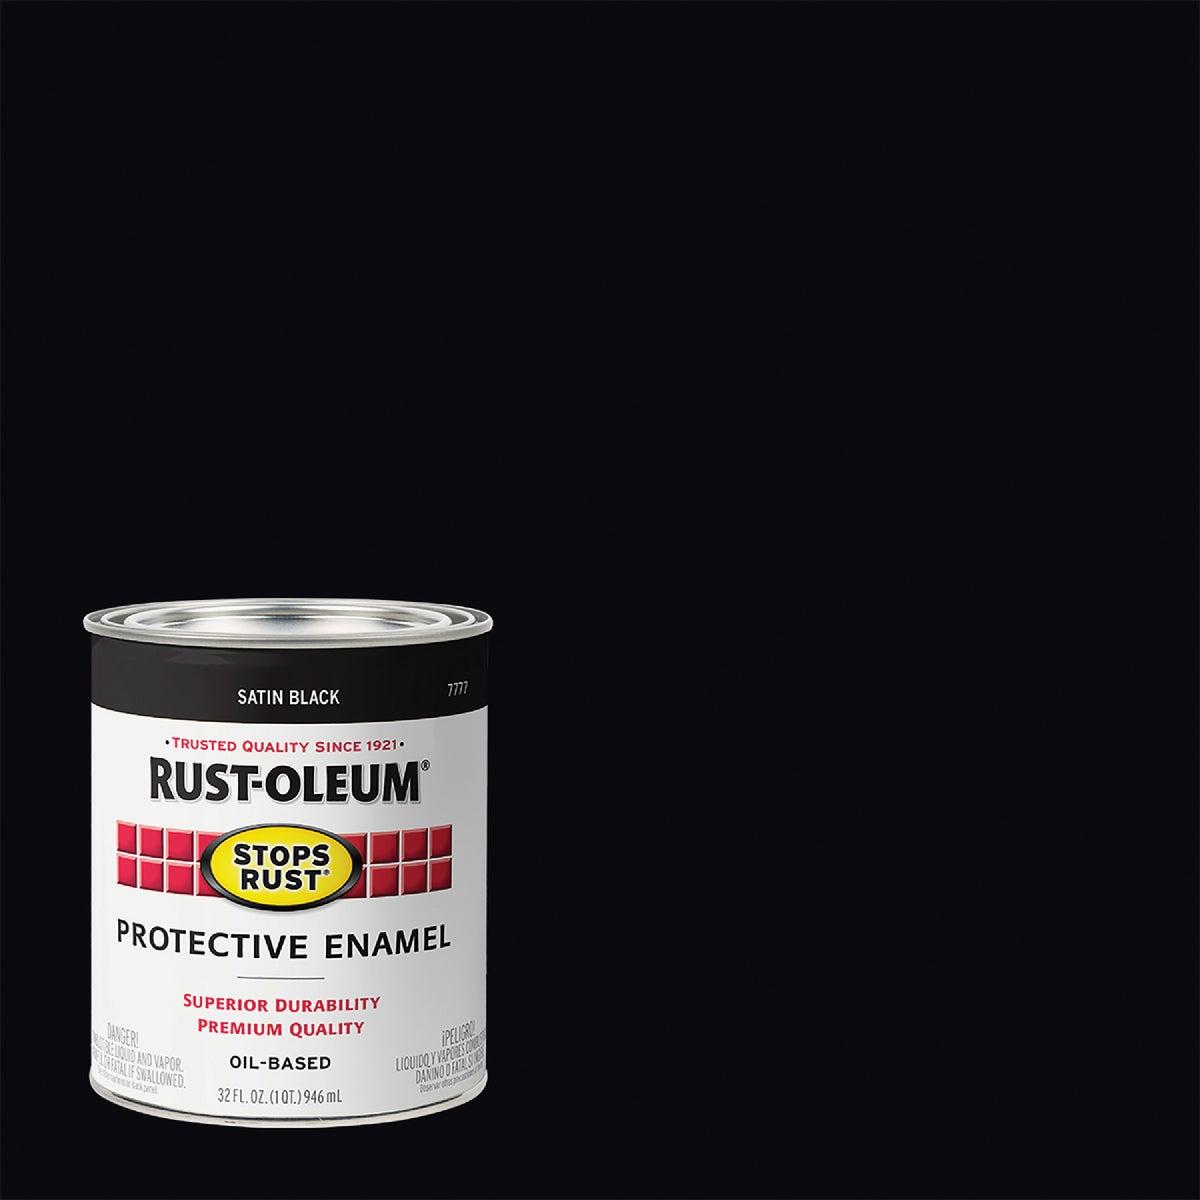 SATIN BLACK ENAMEL